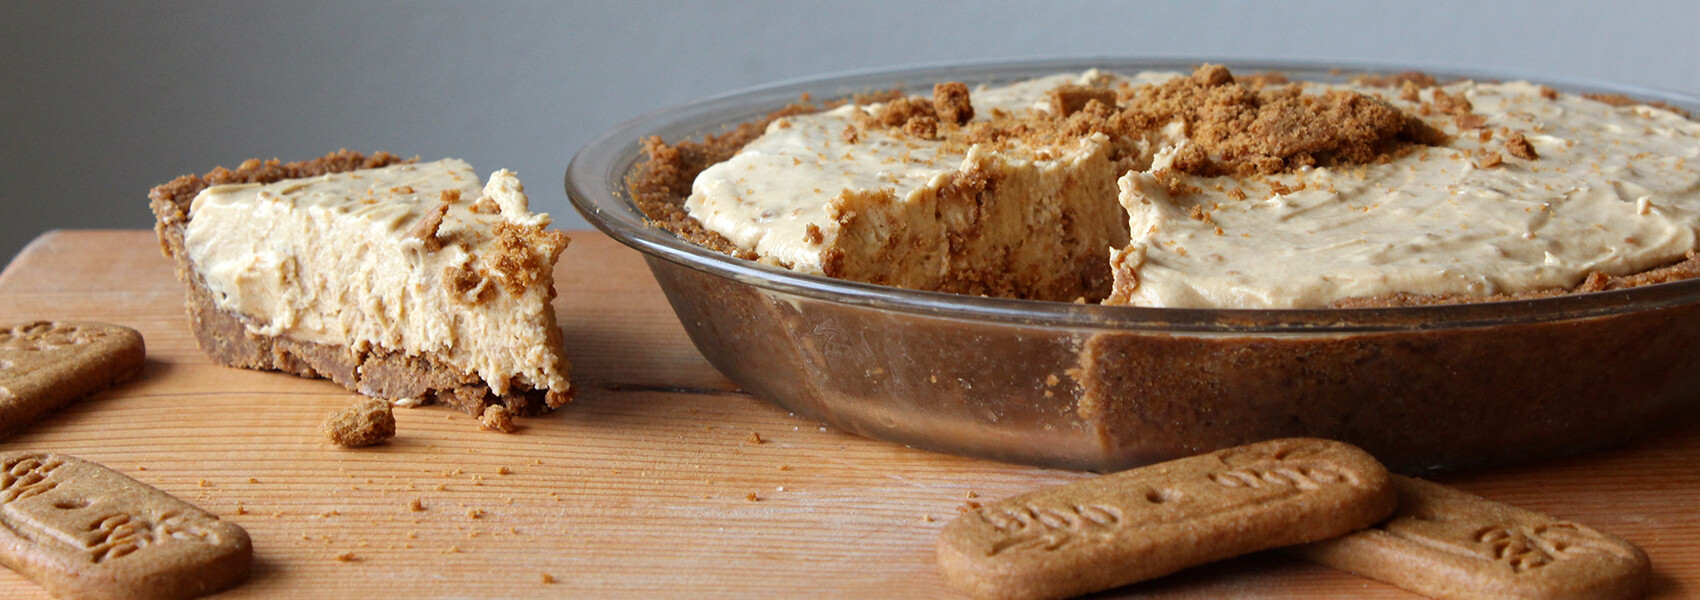 Biscoff Cookie Butter Pie (Photo: Chelsi Fisher)